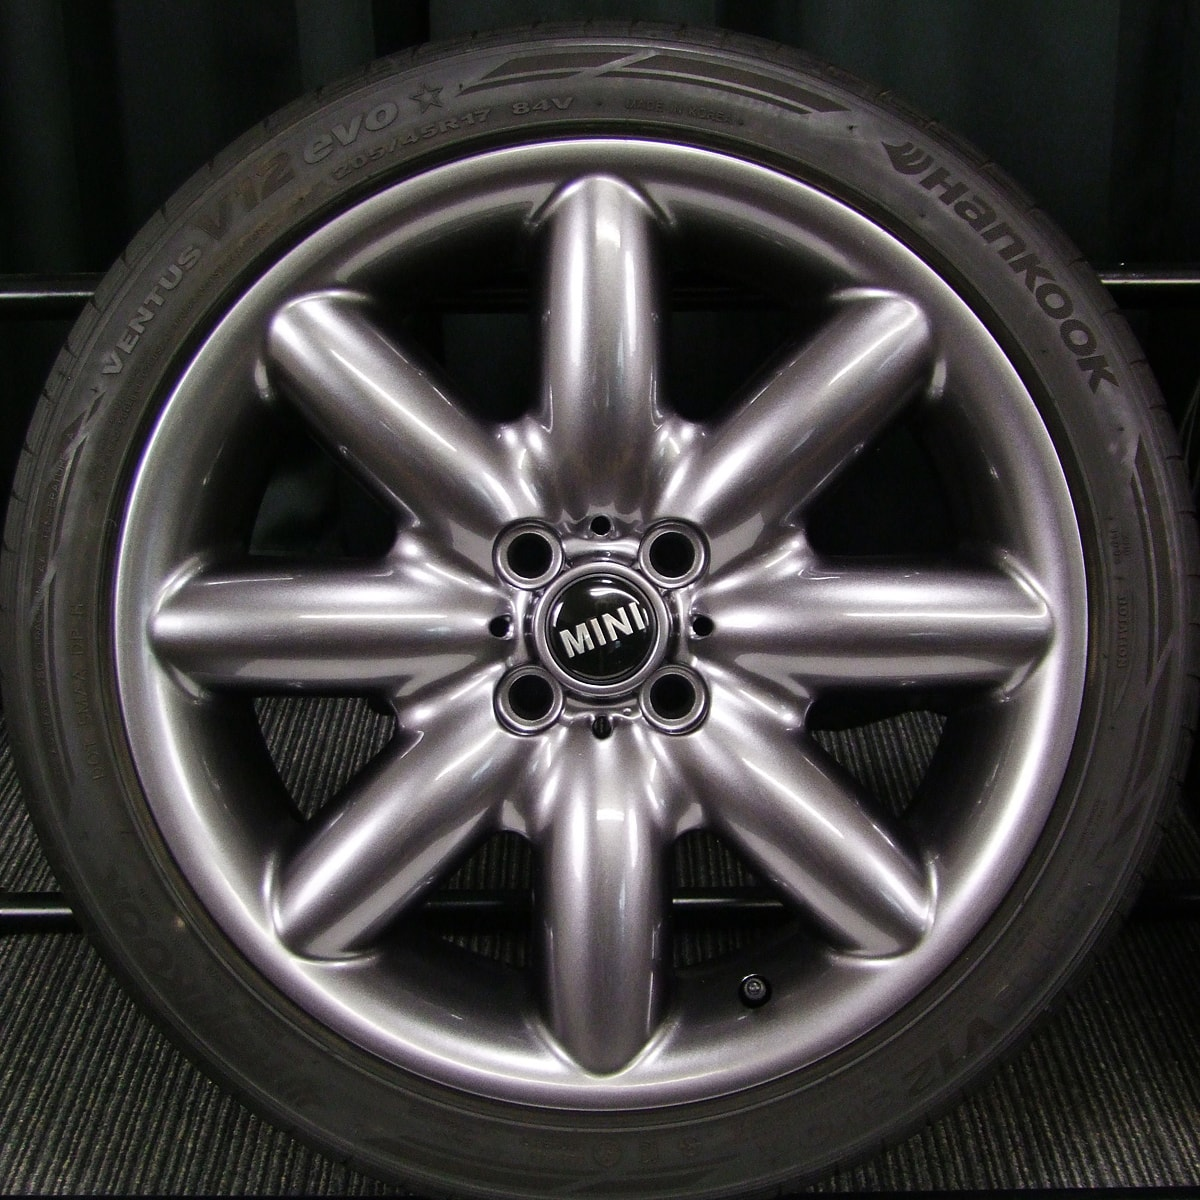 BMW MINI 純正 SスポークR85 ガンメタ HANKOOK VENTUS V12 evo 205/45R17 4本SET